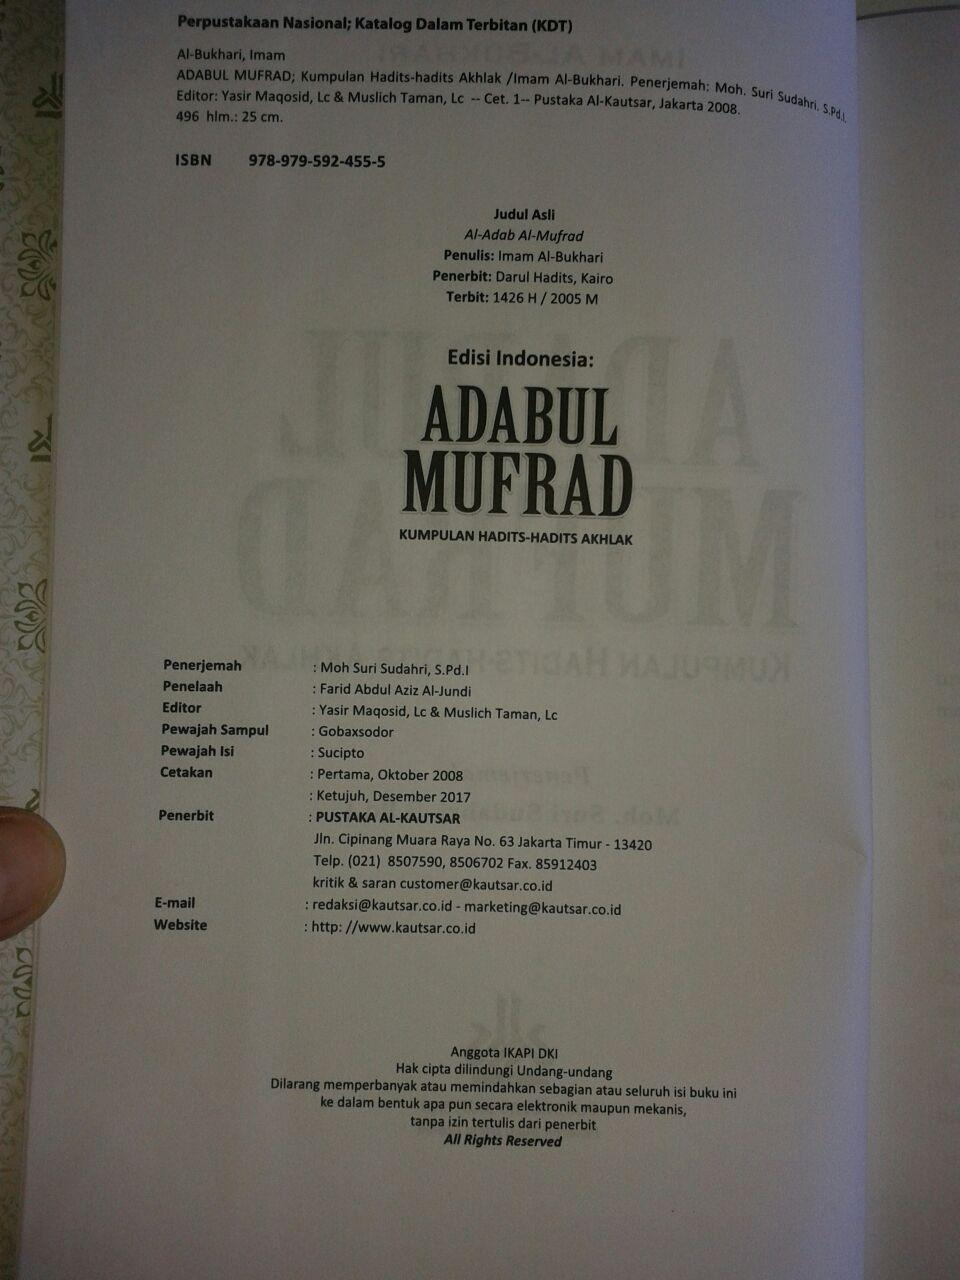 Buku Adabul Mufrad Kumpulan Hadits-Hadits Akhlak isi 2